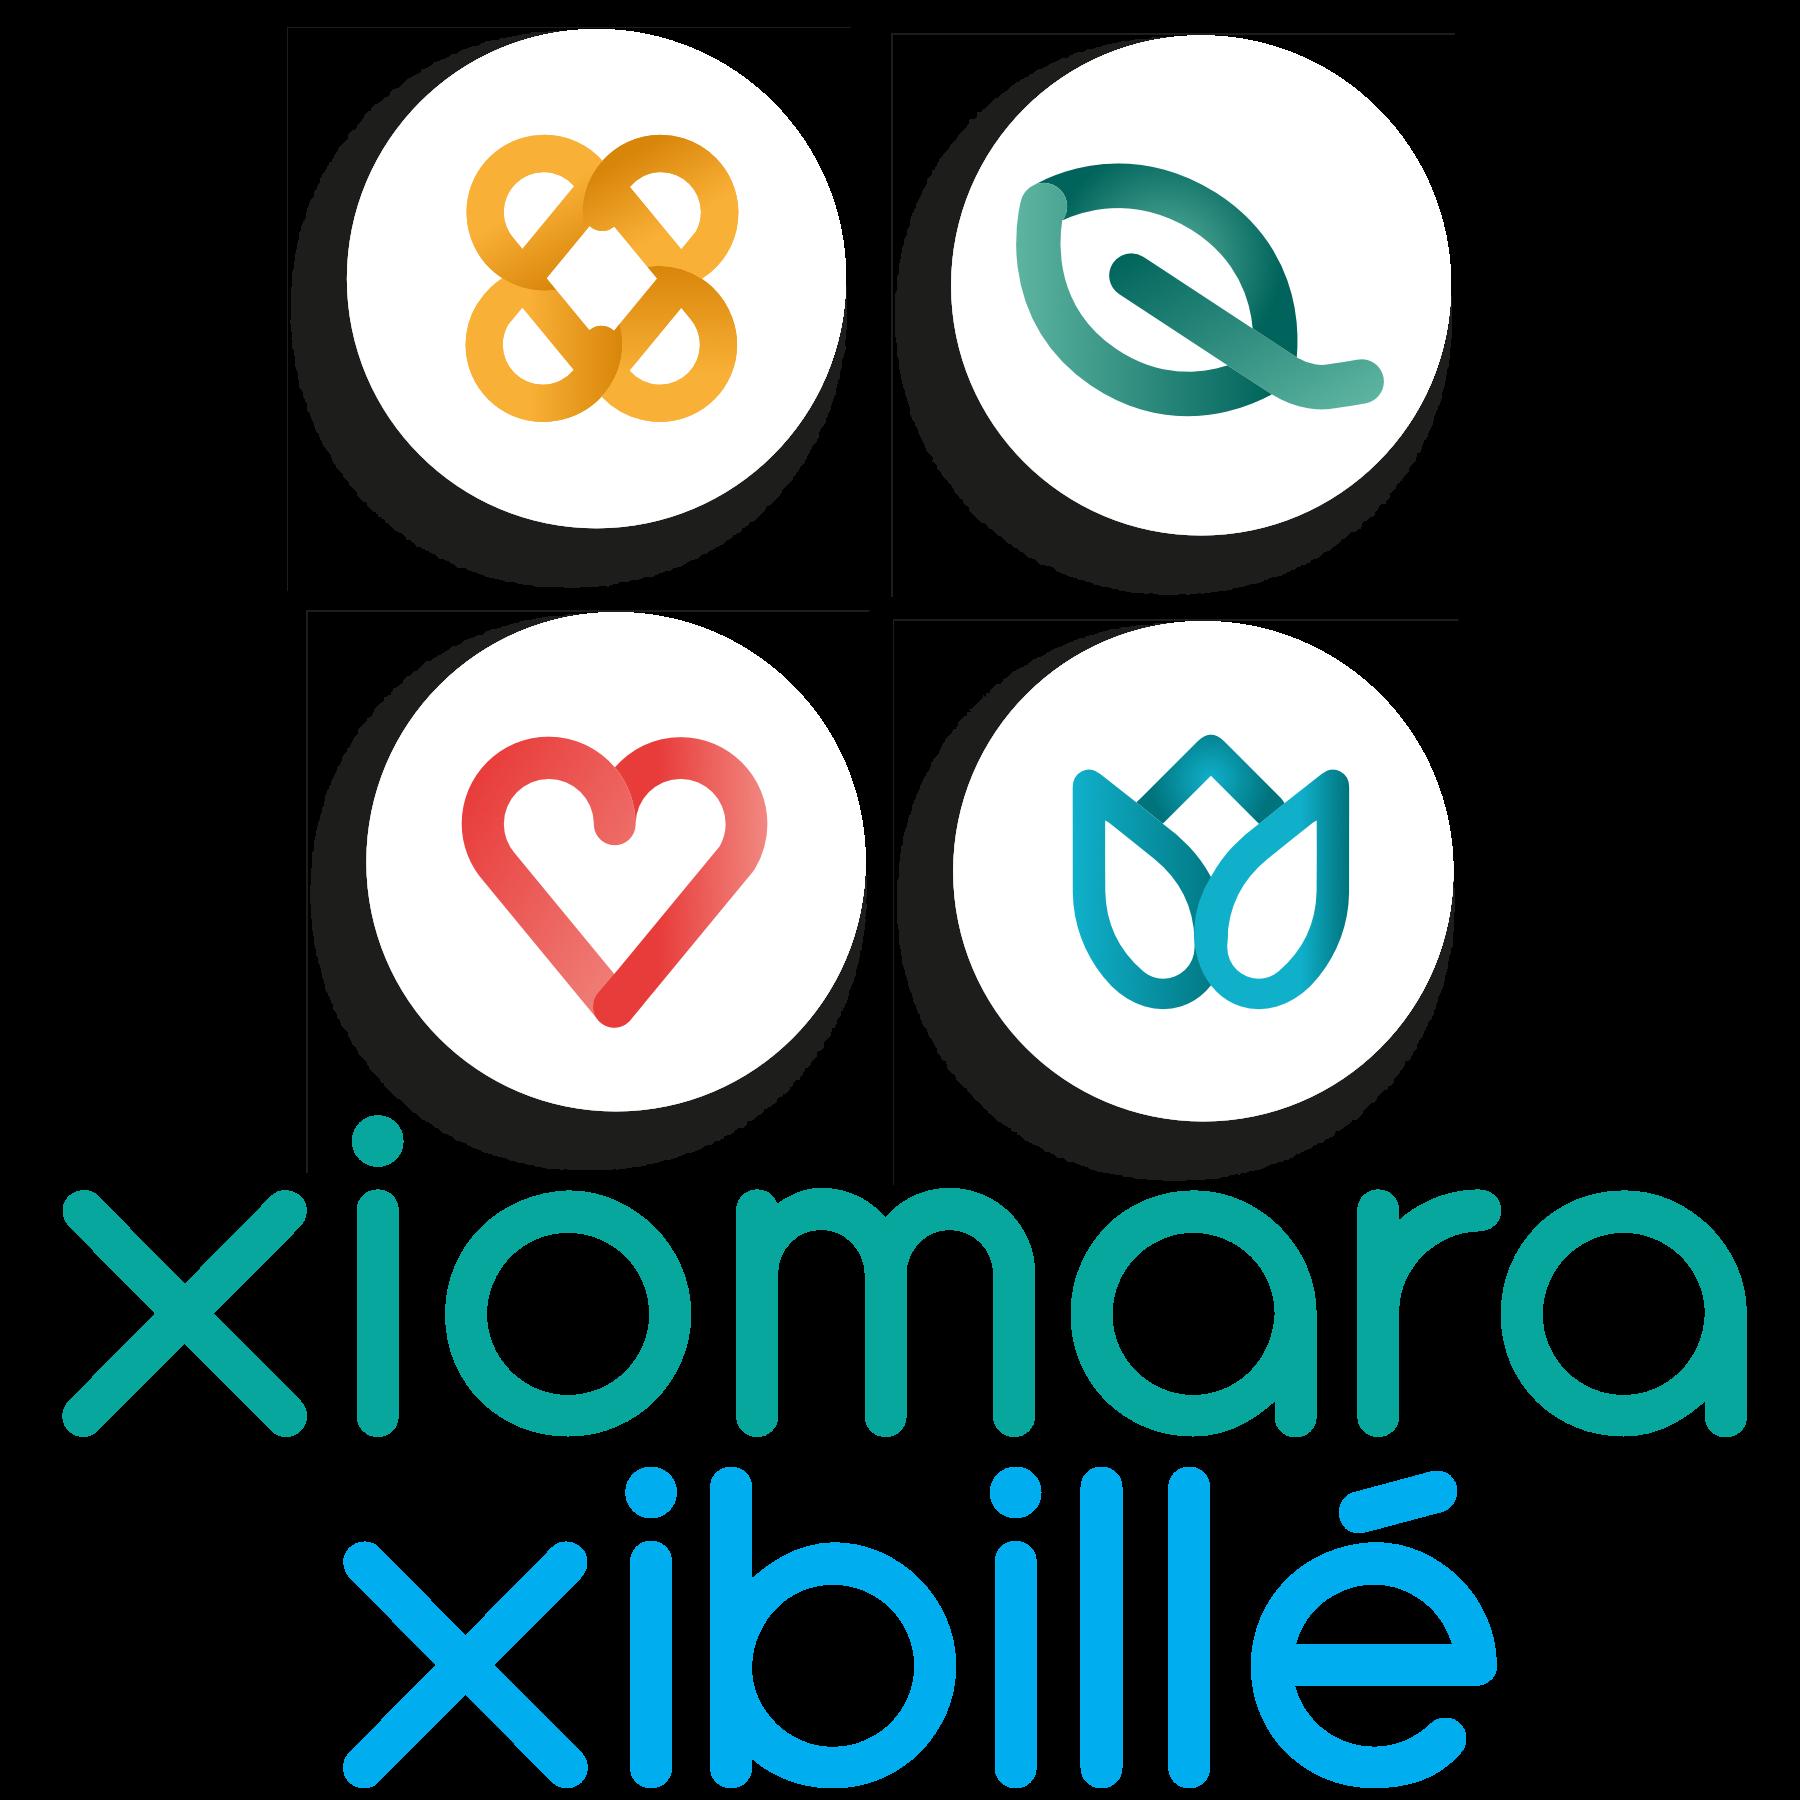 Xiomara Xibille